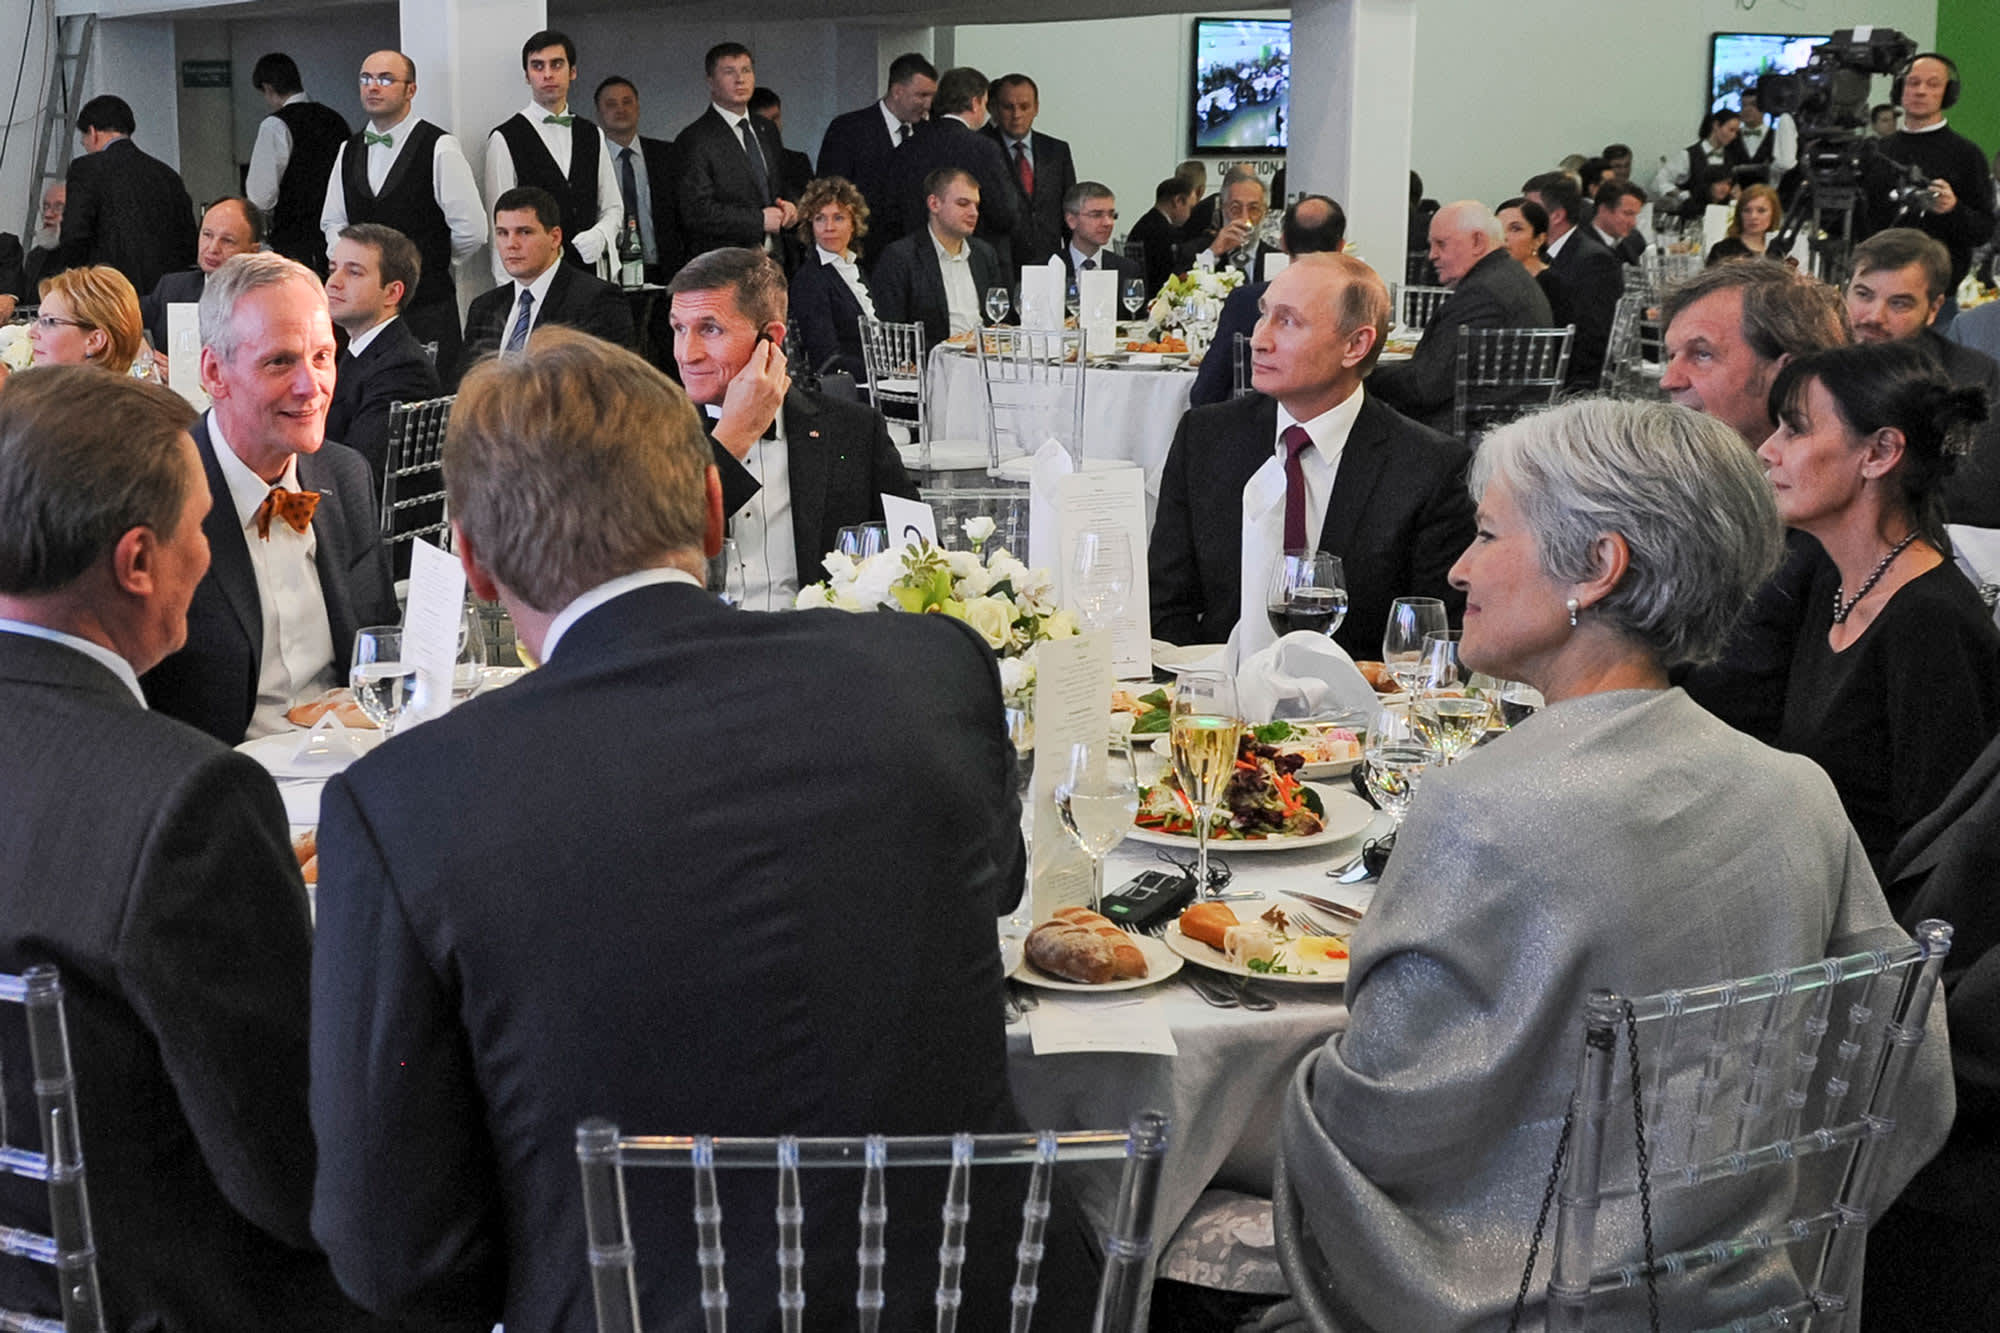 Emir Kusturica: Russia must protect Russians in Ukraine 03/03/2014 10